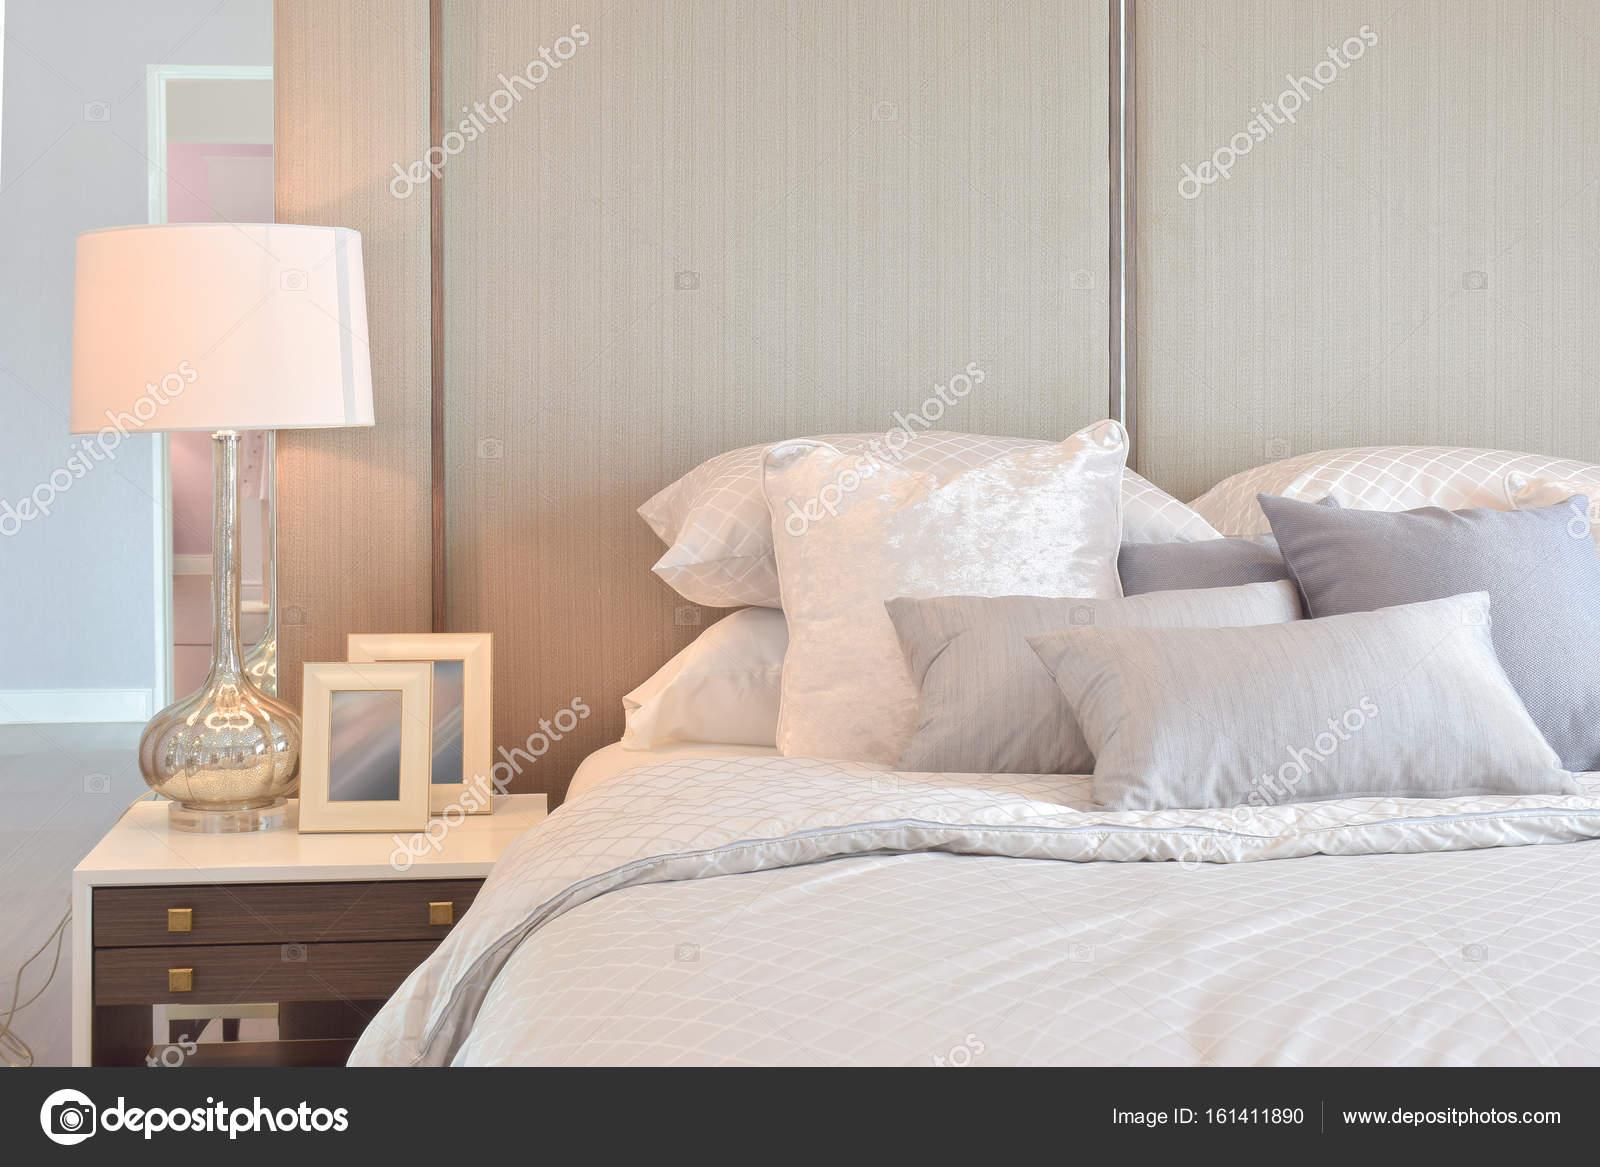 https://st3.depositphotos.com/6200870/16141/i/1600/depositphotos_161411890-stock-photo-classic-bedroom-interior-with-pillows.jpg